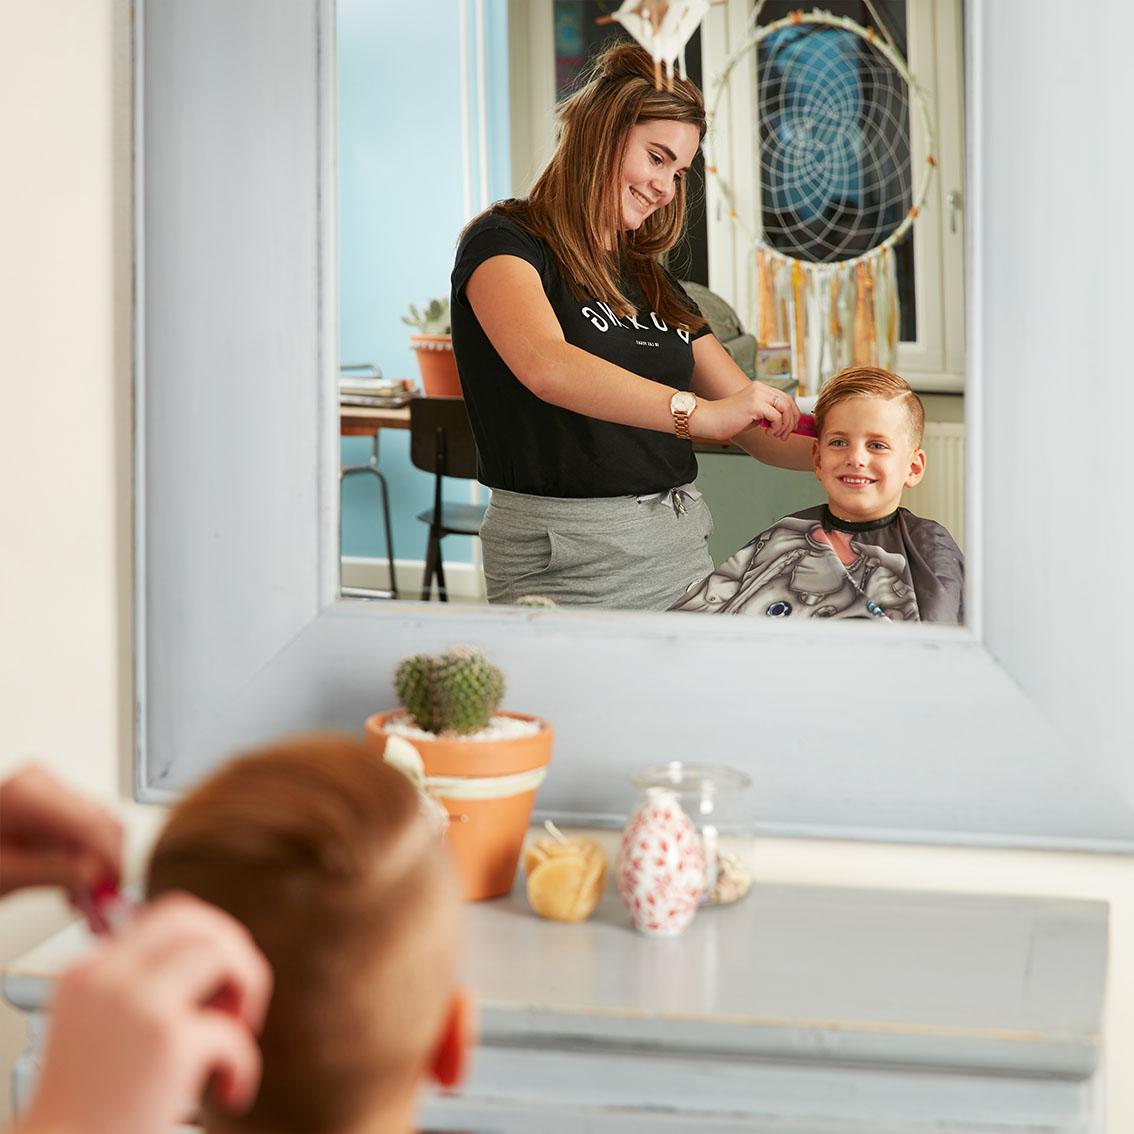 Hairdesign Gabry - Kapsallon voor kinderen in Zuid-Limburg